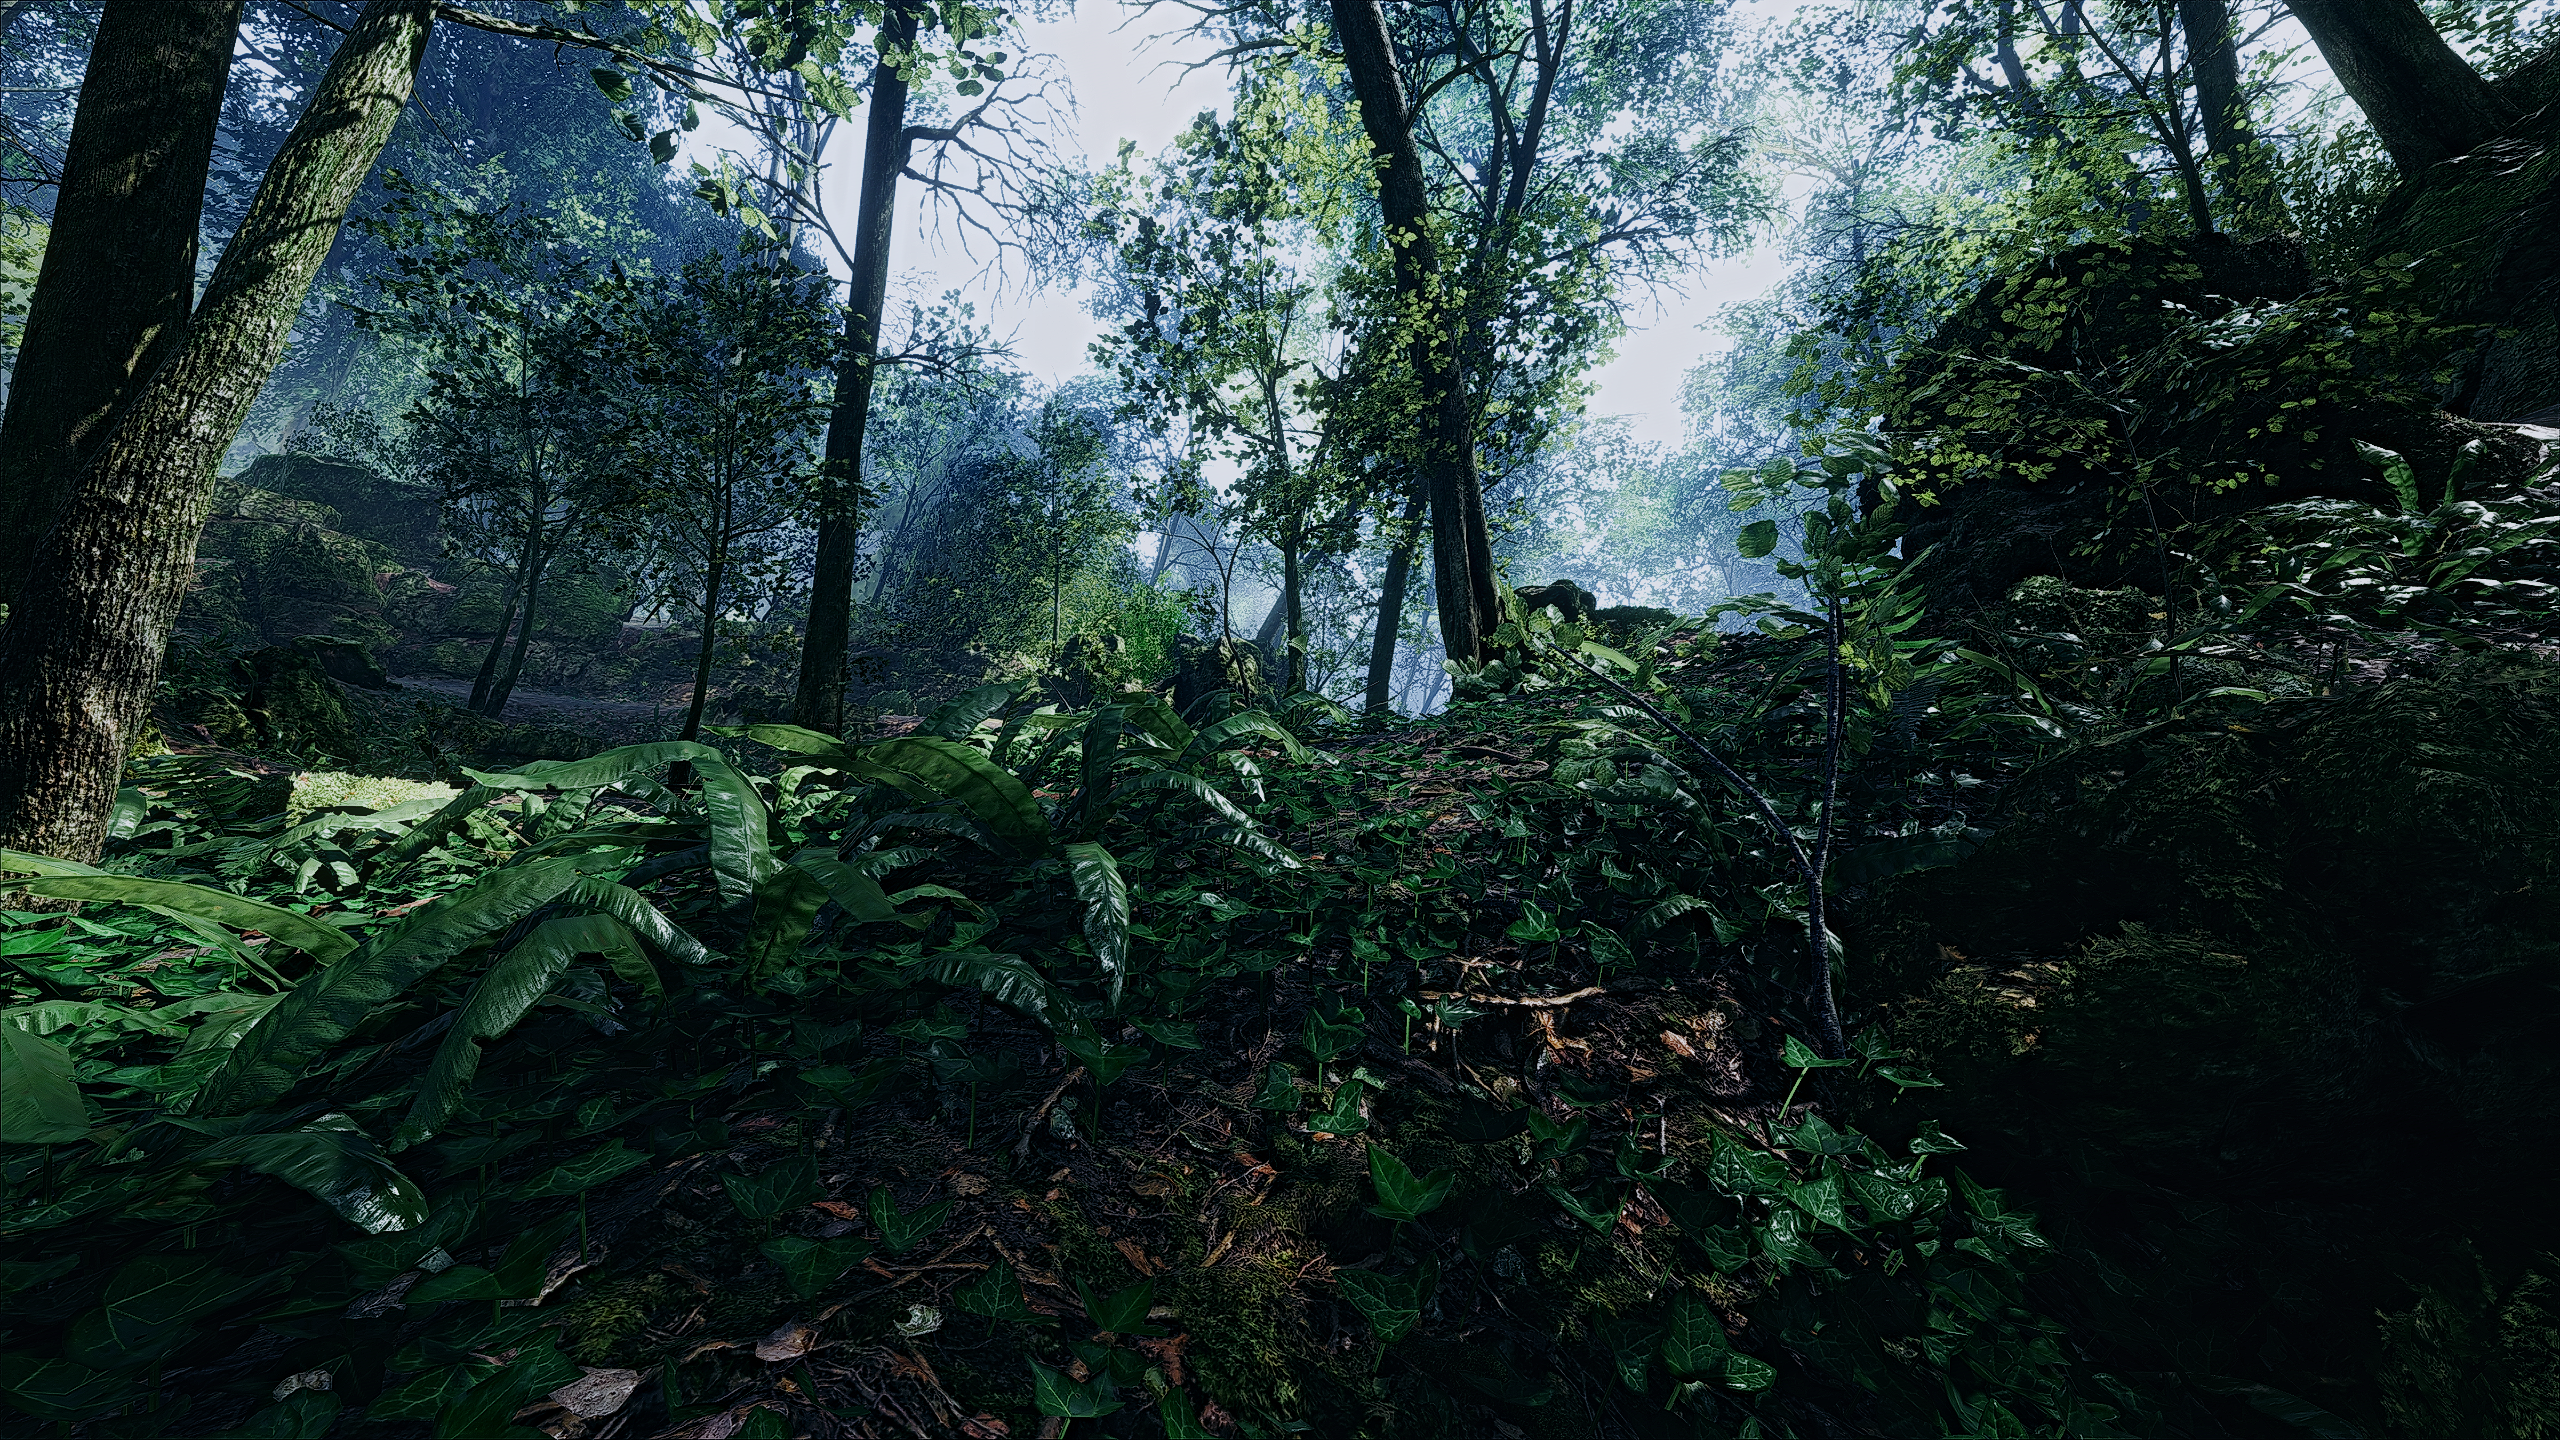 Battlefield 1 Hd Wallpaper Background Image 2560x1440 Id 936329 Wallpaper Abyss